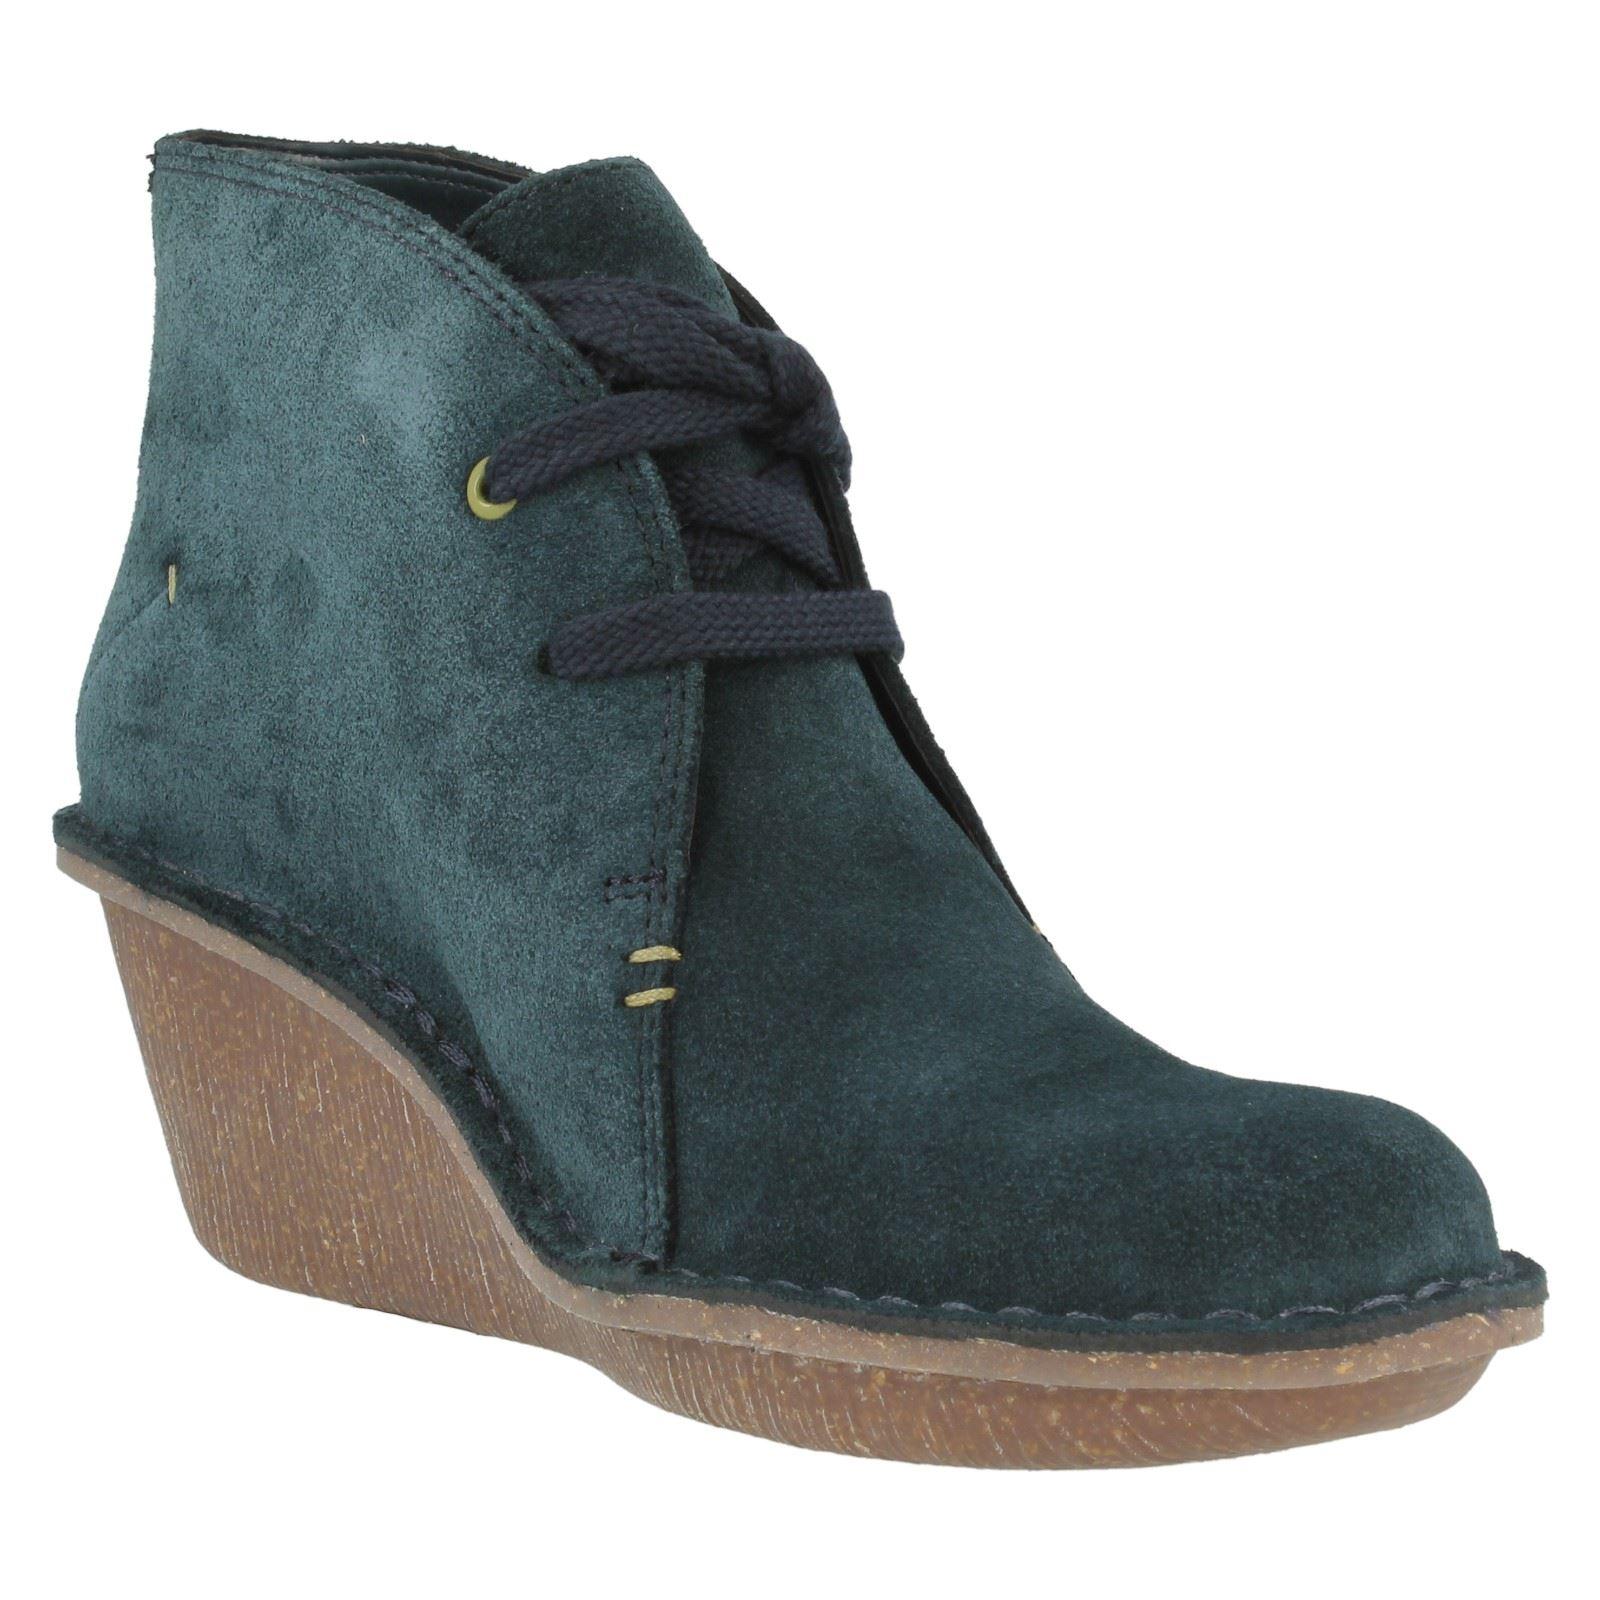 clarks marsden wedge boots ebay